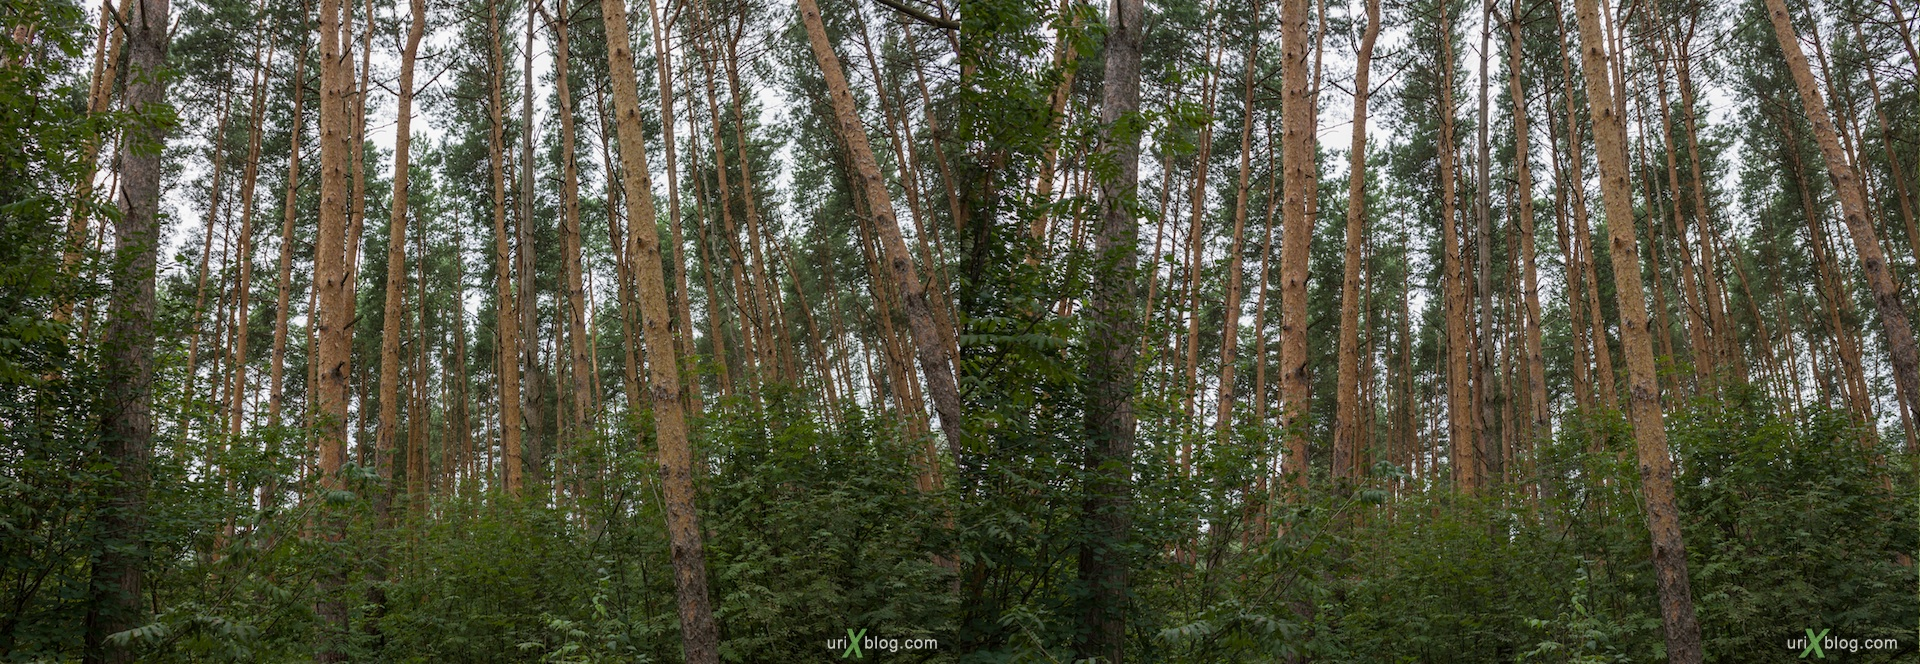 2012 3D stereo stereo pair 3Д стерео Волга река Кимры Лес Тверская область